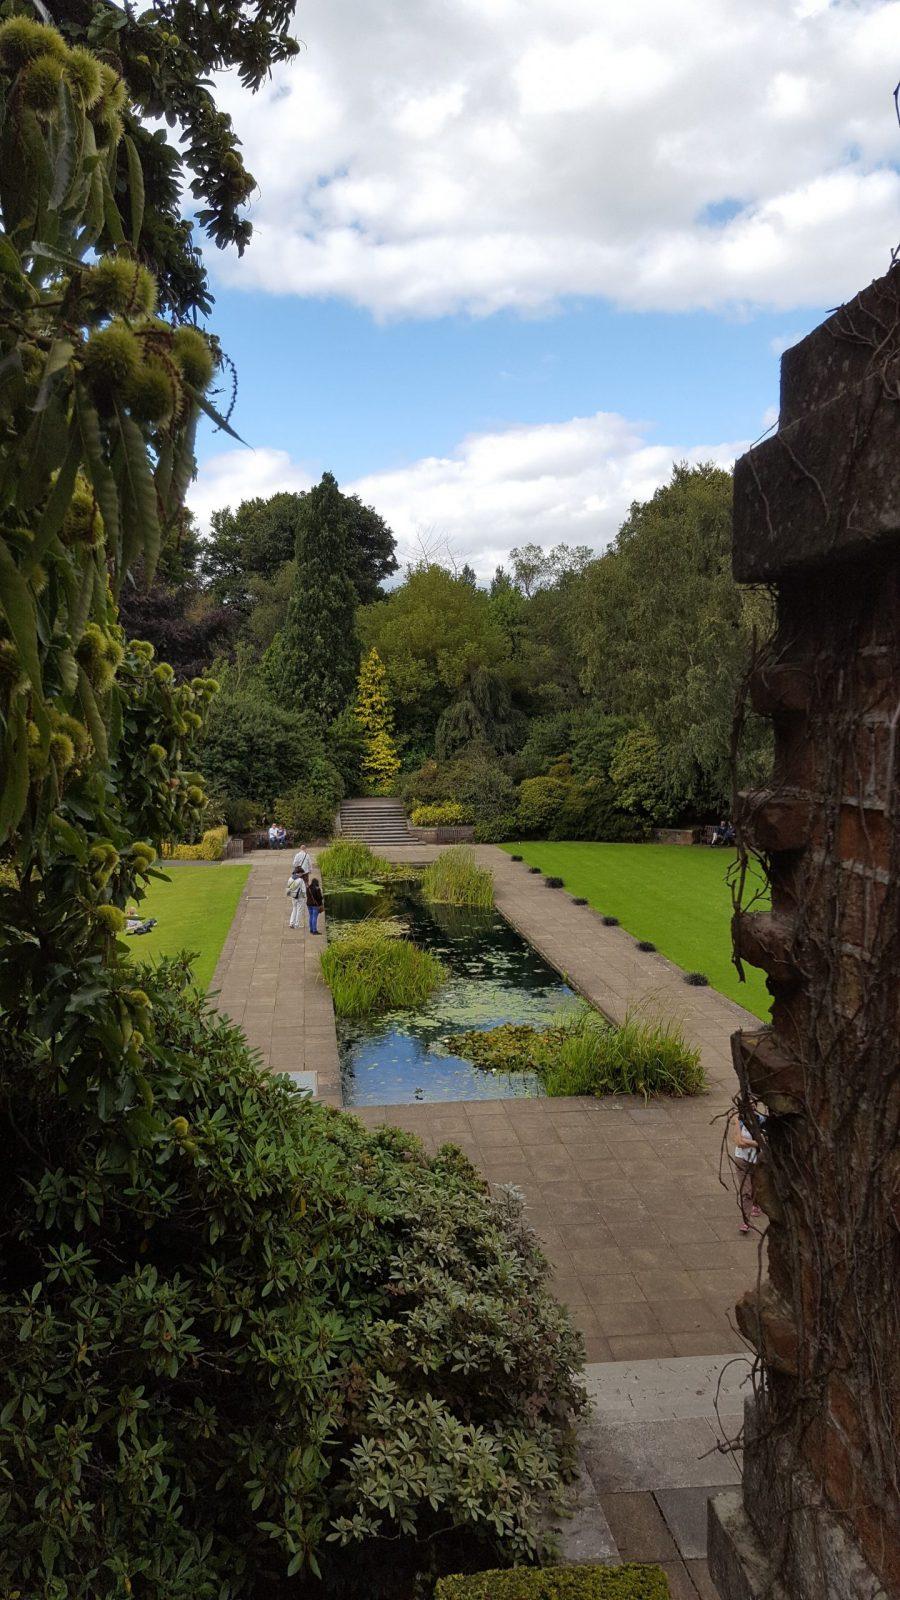 Visiting Hill Garden & Pergola, Hampstead Heath: Photo Gallery 18